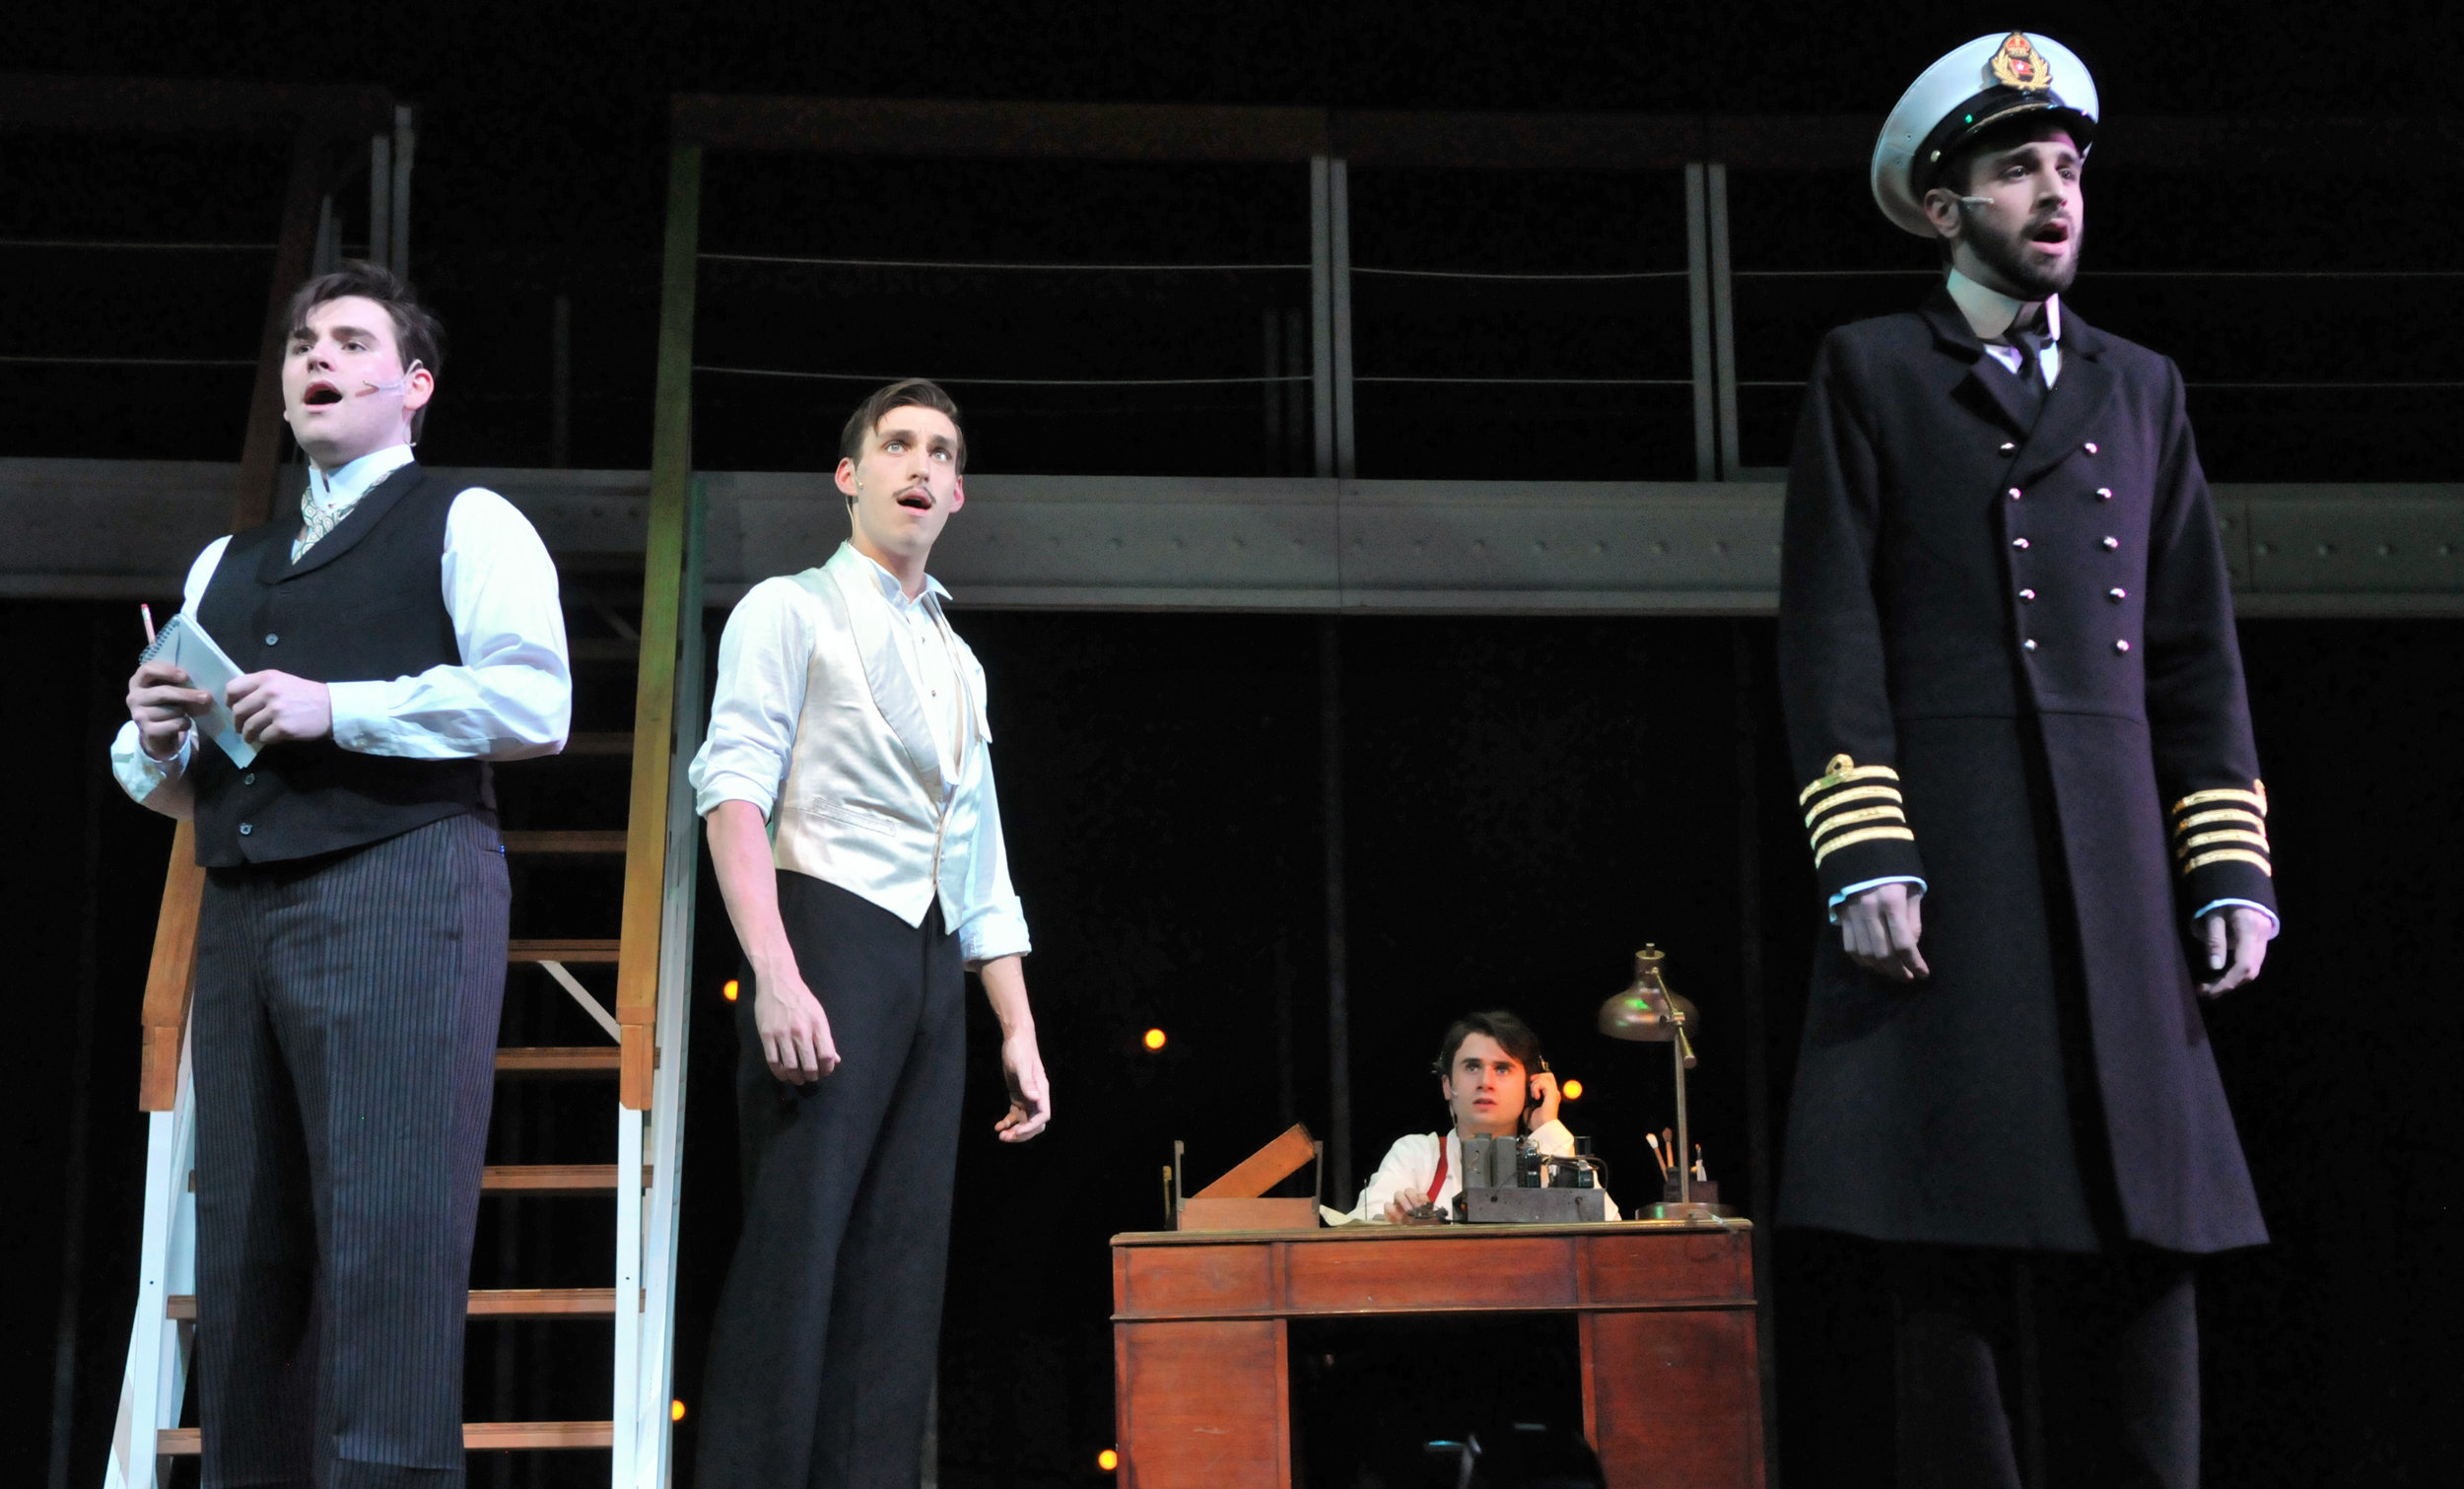 emerson-stage---titanic_33937748730_o.jpg